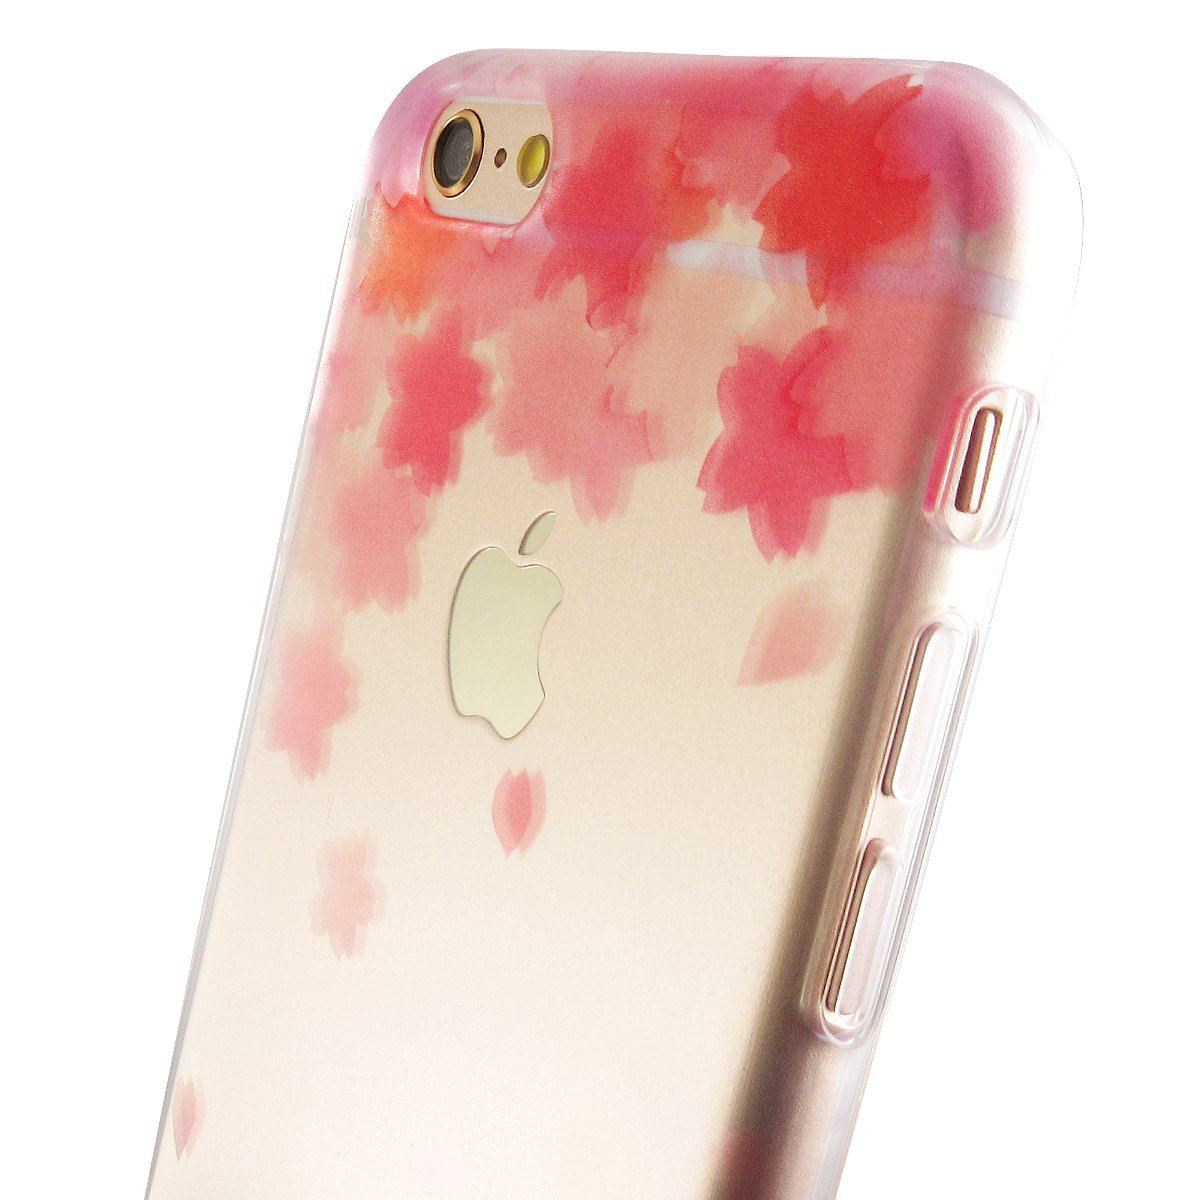 HawkEye IPhone6 Plus /6 jalpanese style ukiyo - E của iPhone vỏ bọc ở Nhật Bản chế tạo lõi iPhone6 /